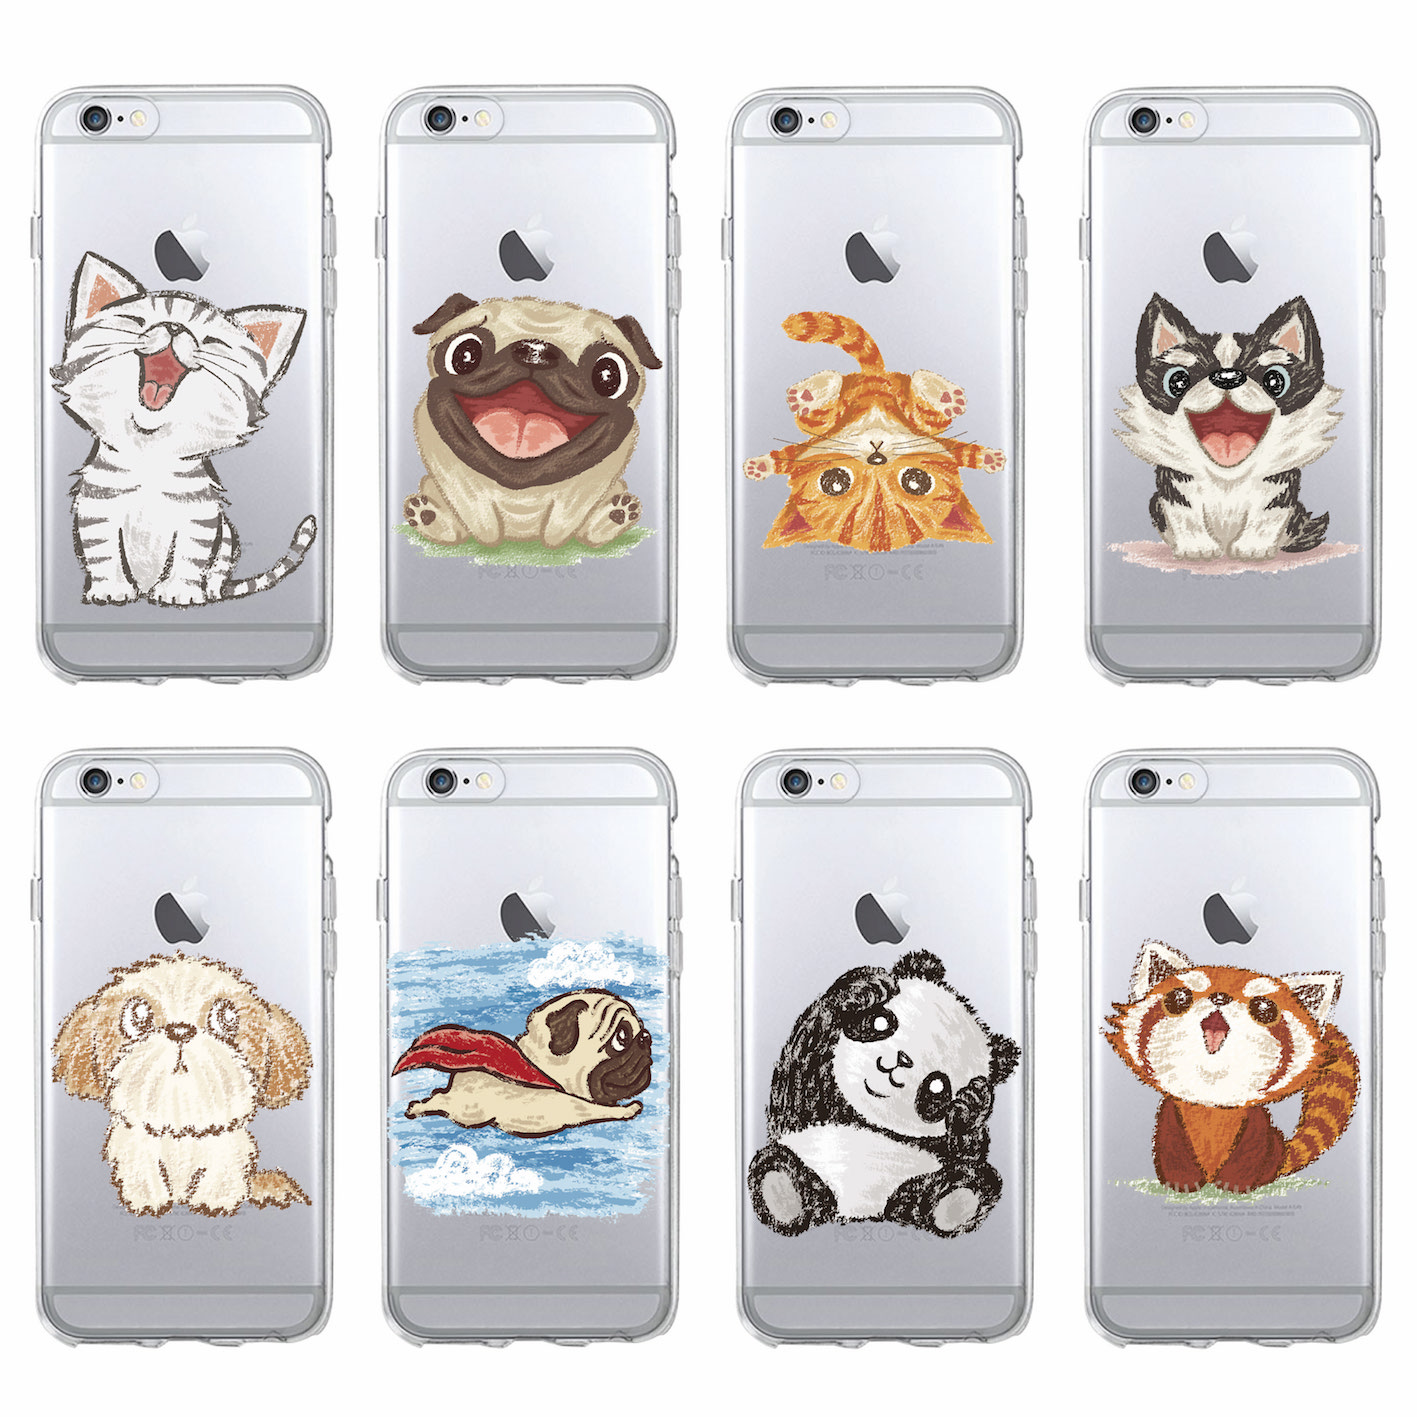 Cute Cat Panda Puppy Dog Bulldog Bear Cartoon Soft Phone Case Fundas Coque For iPhone 7 7Plus 6 6S 6Plus 8 8Plus X SAMSUNG